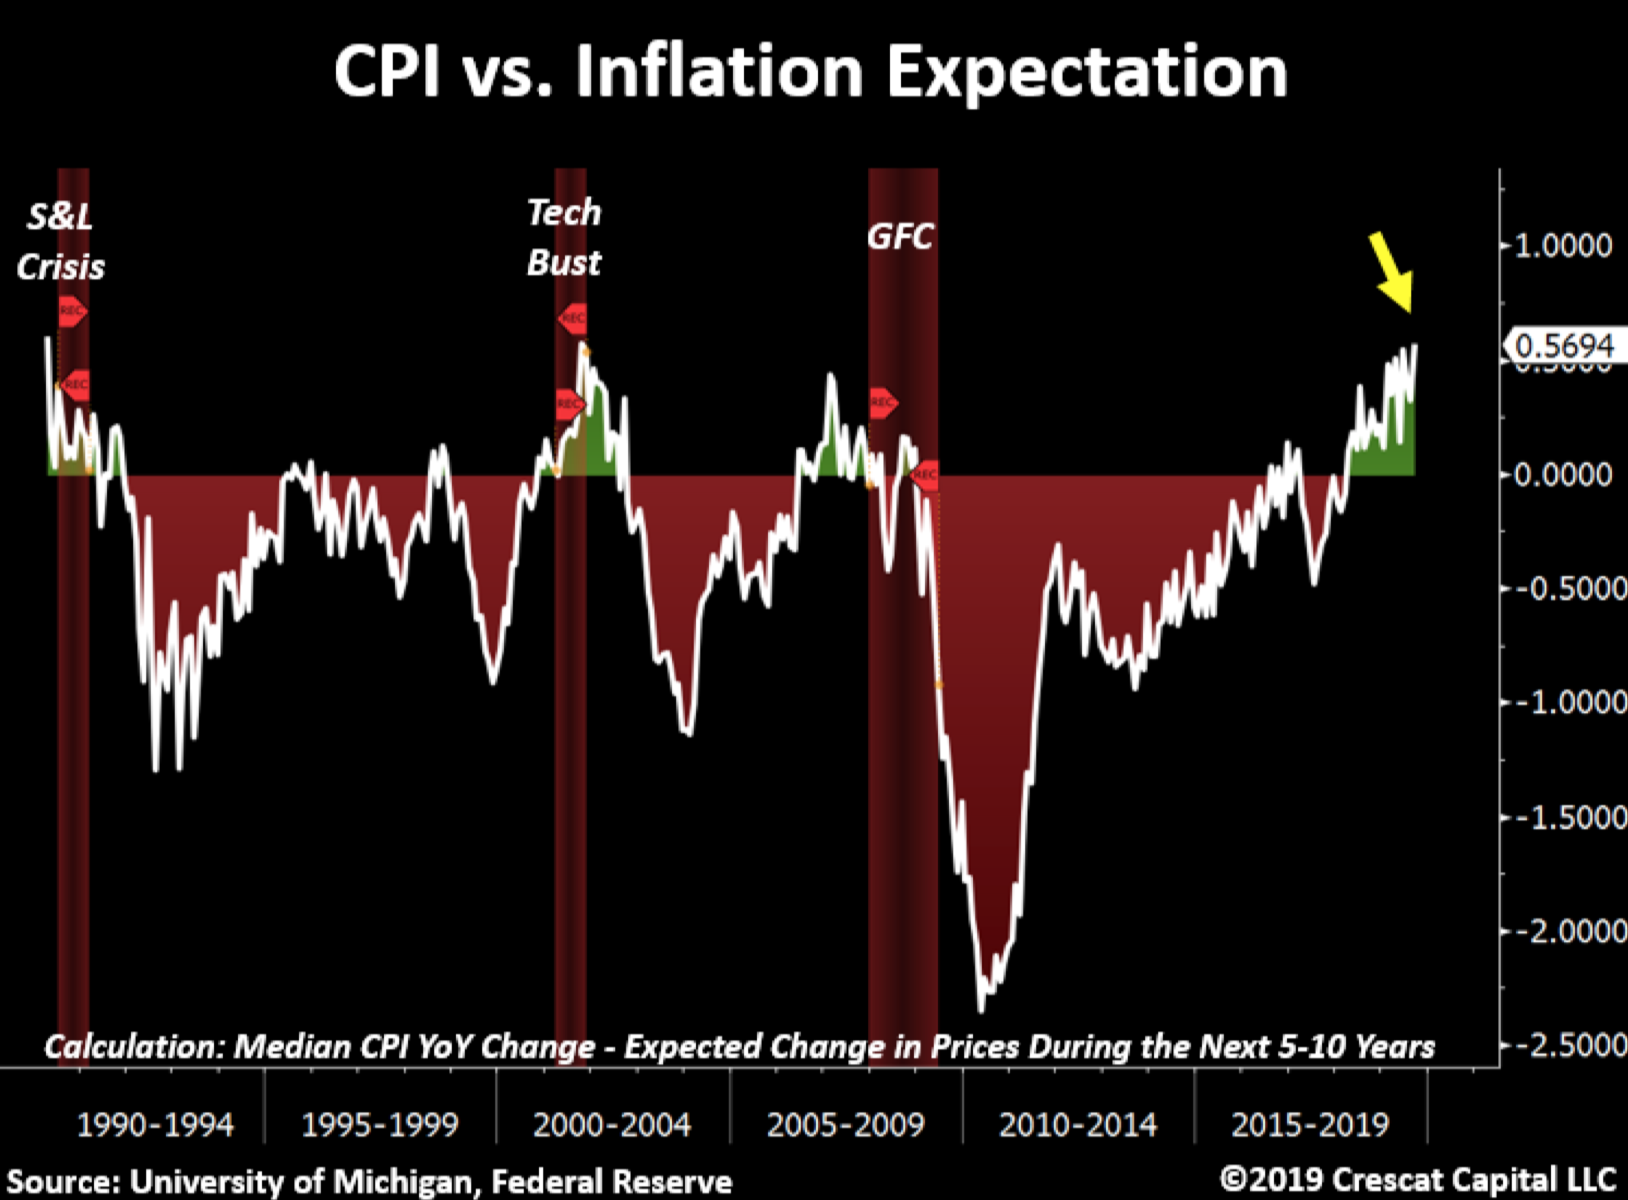 CPI vs Inflationserwartungen - Quelle: Crescat Capital LLC